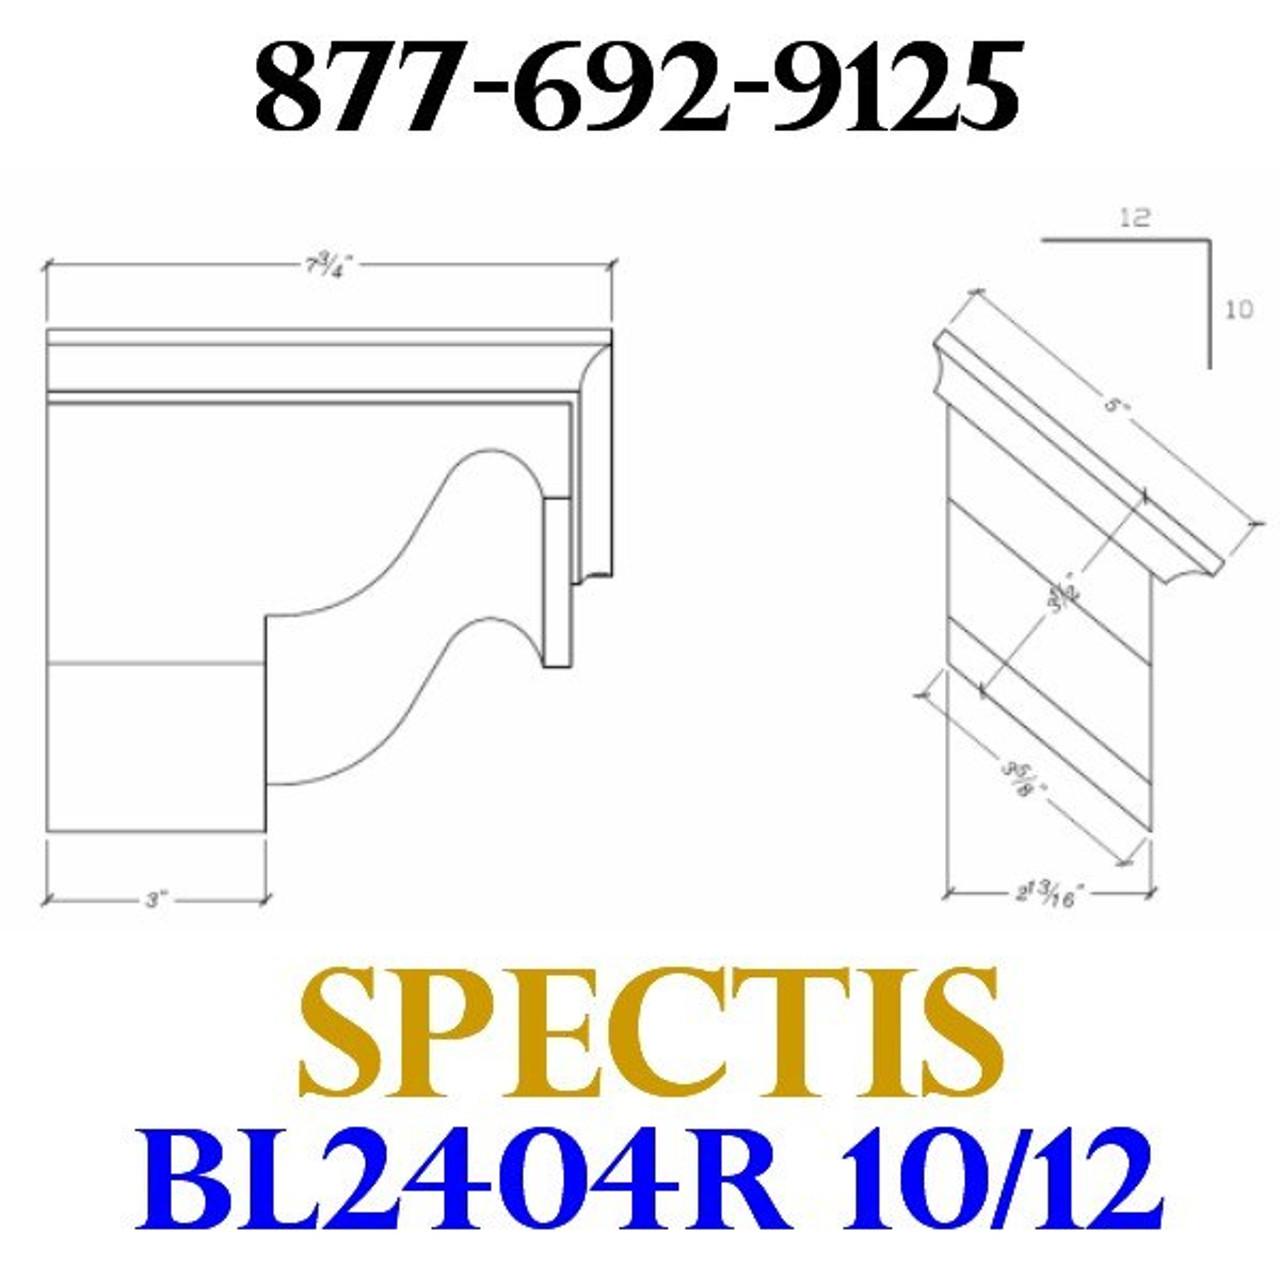 "BL2404R-10/12 Pitch Corbel or Eave Bracket 5""W x 3.5""H x 7.75"" P"